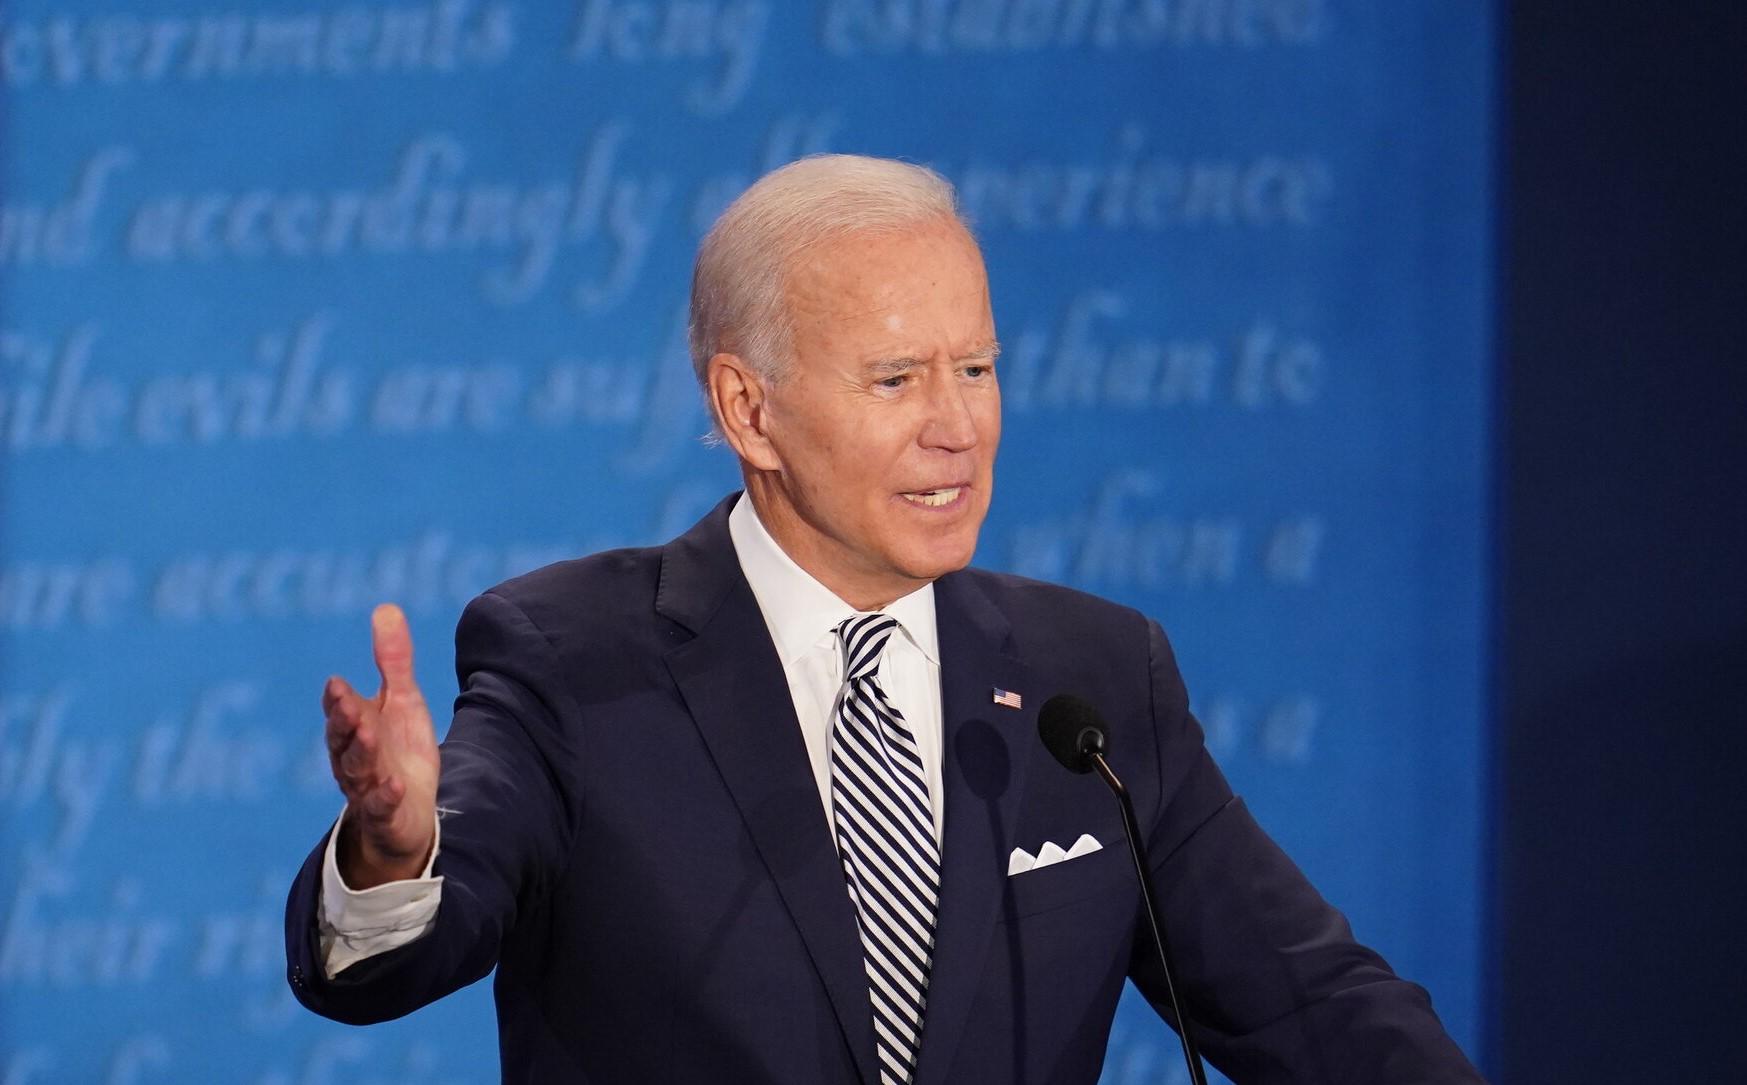 American Jewish Congress congratulates President-elect Joe Biden